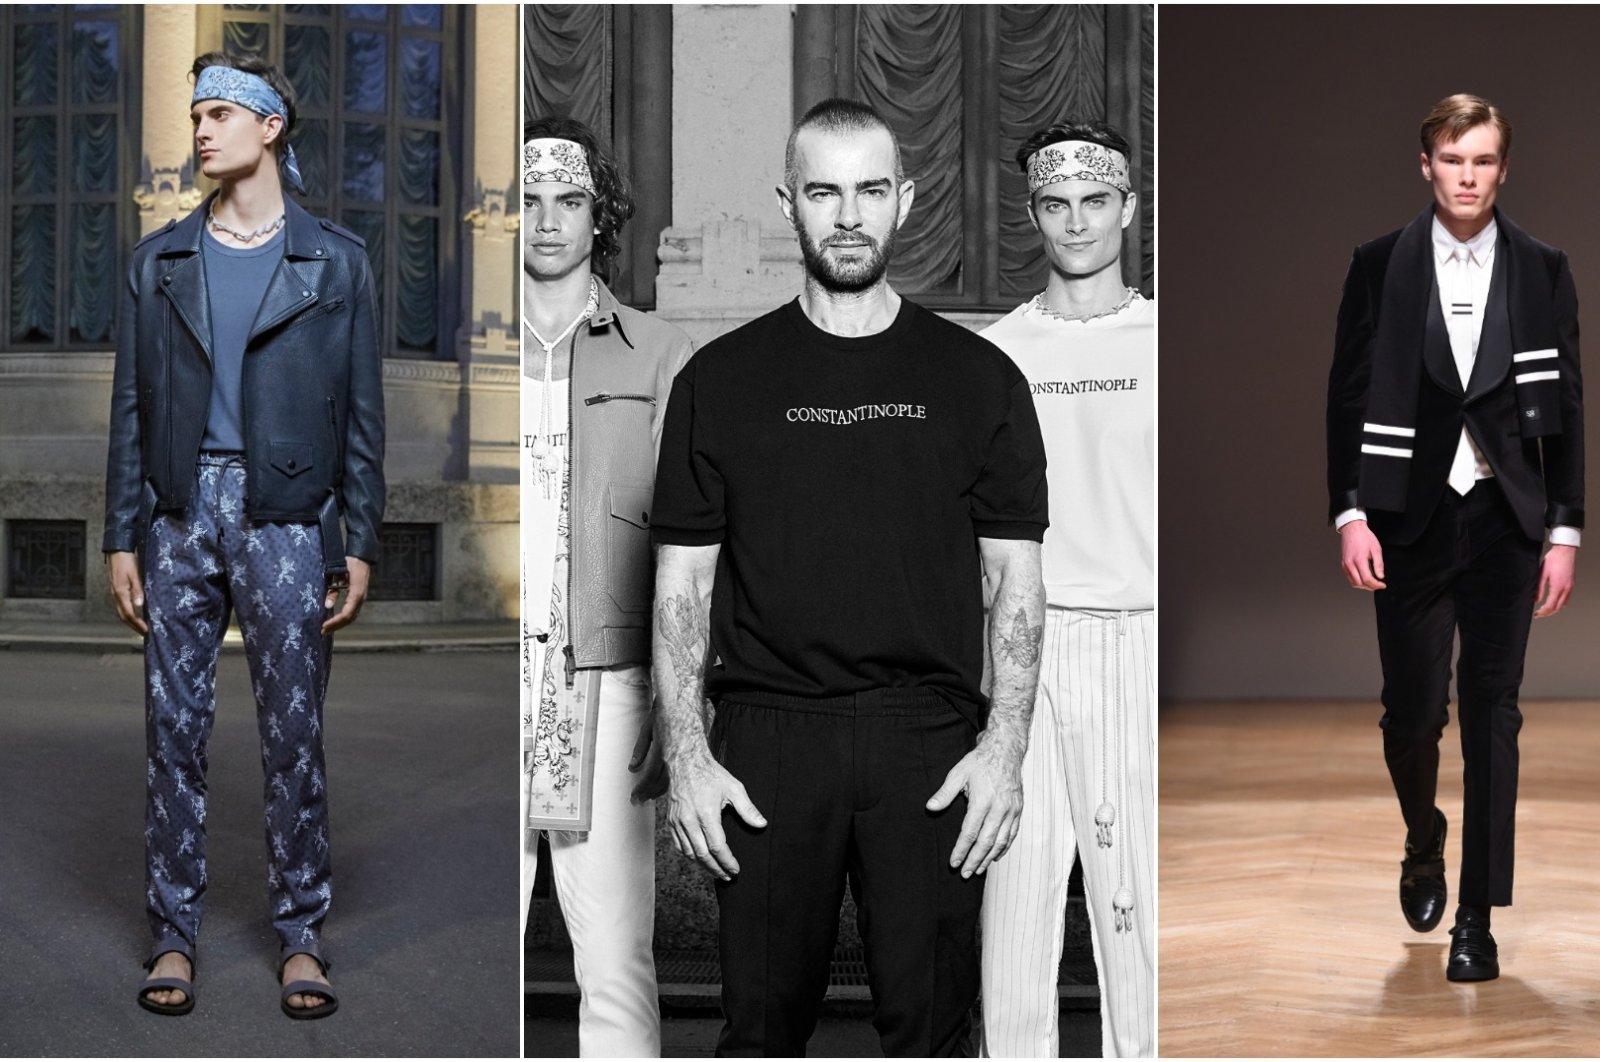 Turkish designer Serdar Uzuntaş made his debut in Milan in January 2020. (Photos courtesy of Serdar Uzuntaş)